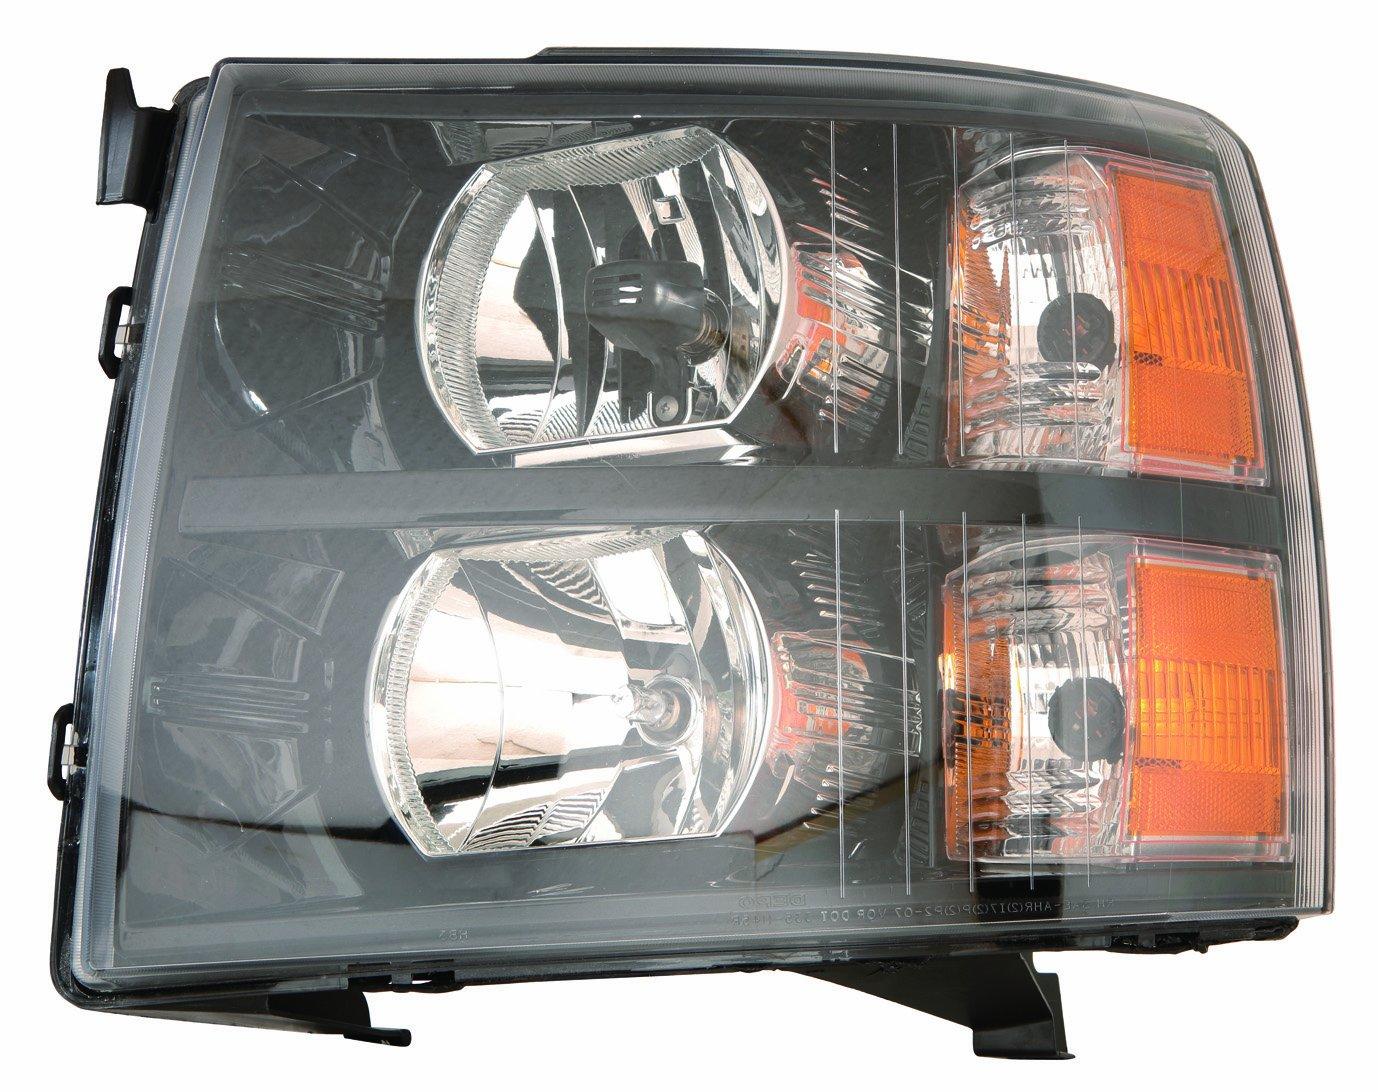 Depo 335 1145p Us2 Chevrolet Silverado Headlight Unit 77 Wiring Harness Set With Black Bezel Automotive